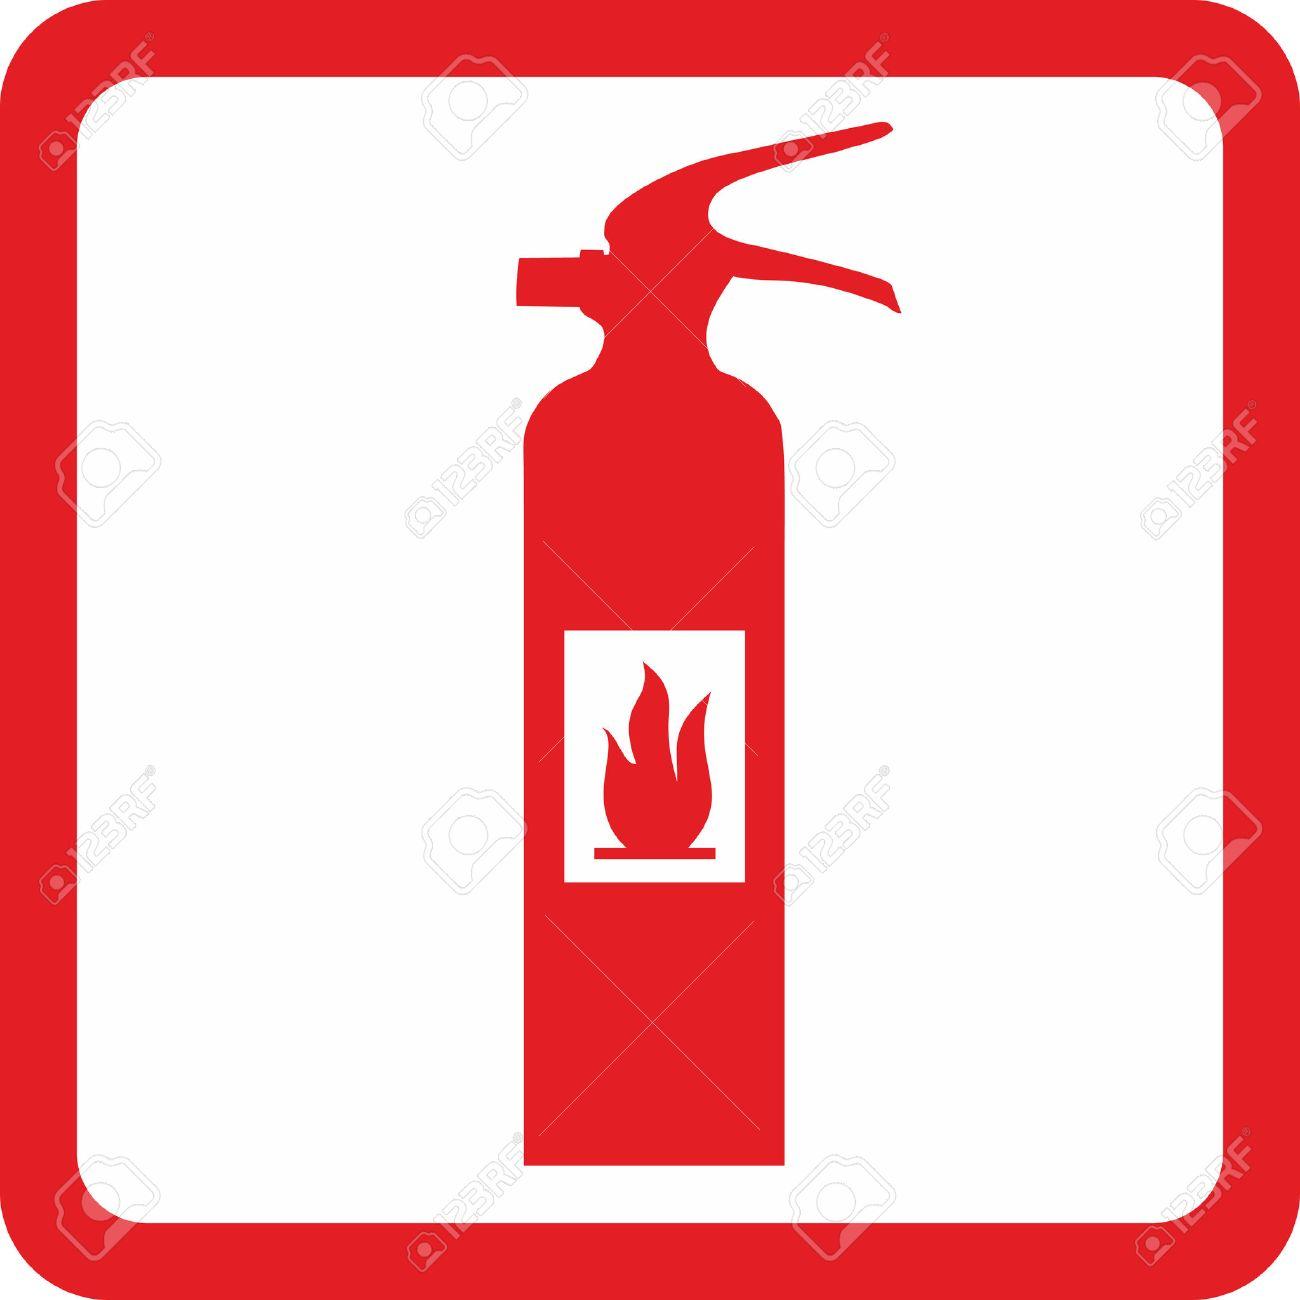 100 fire extinguisher symbol on floor plan hotelsigns com symbol for fire extinguisher in basic relay wiring wiring house buycottarizona